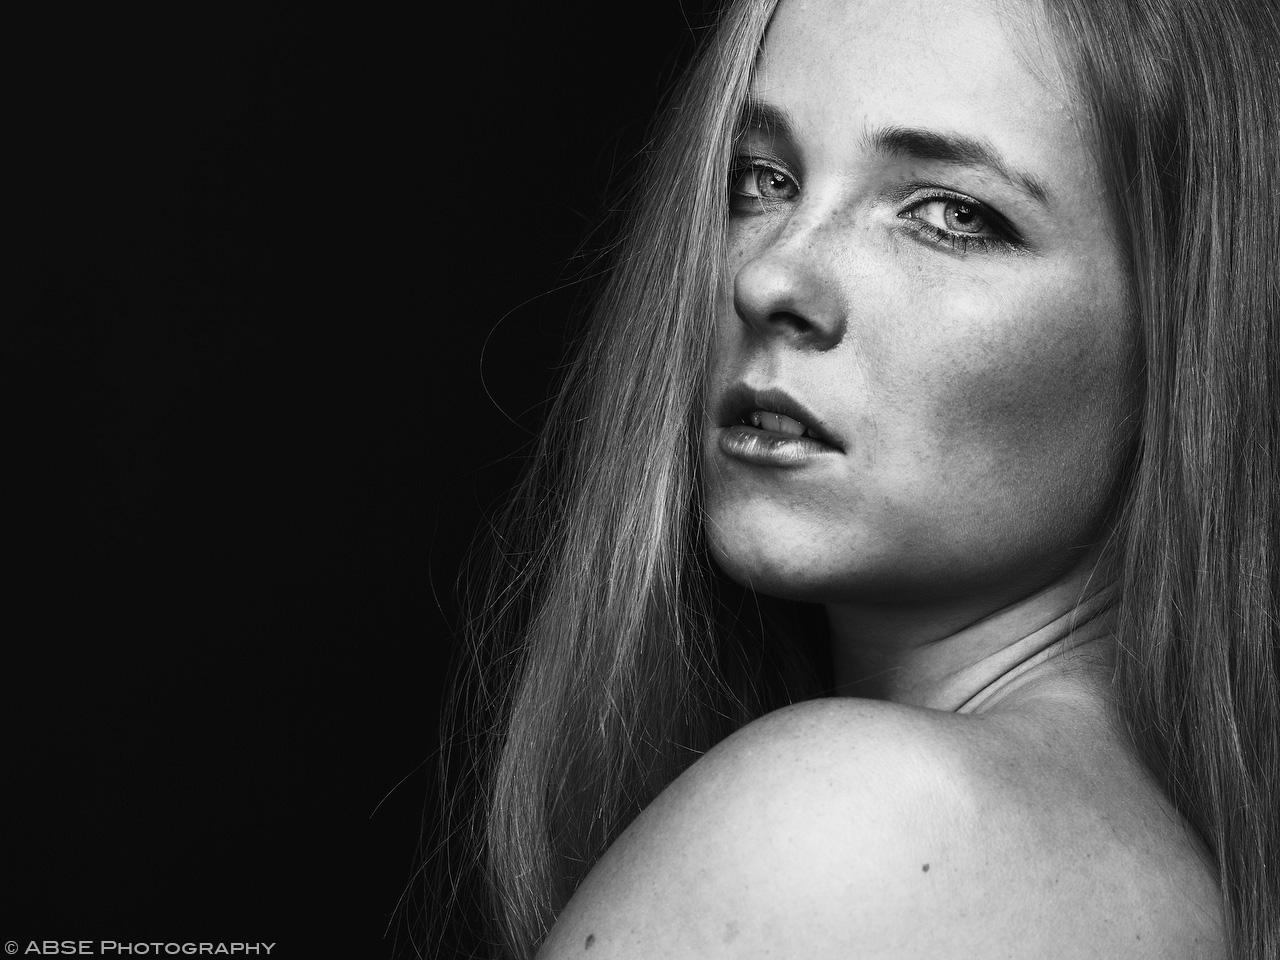 IMAGE: http://blog.absephotography.com/wp-content/uploads/2017/10/aurora-nordica-portrait-studio-black-and-white-2.jpg